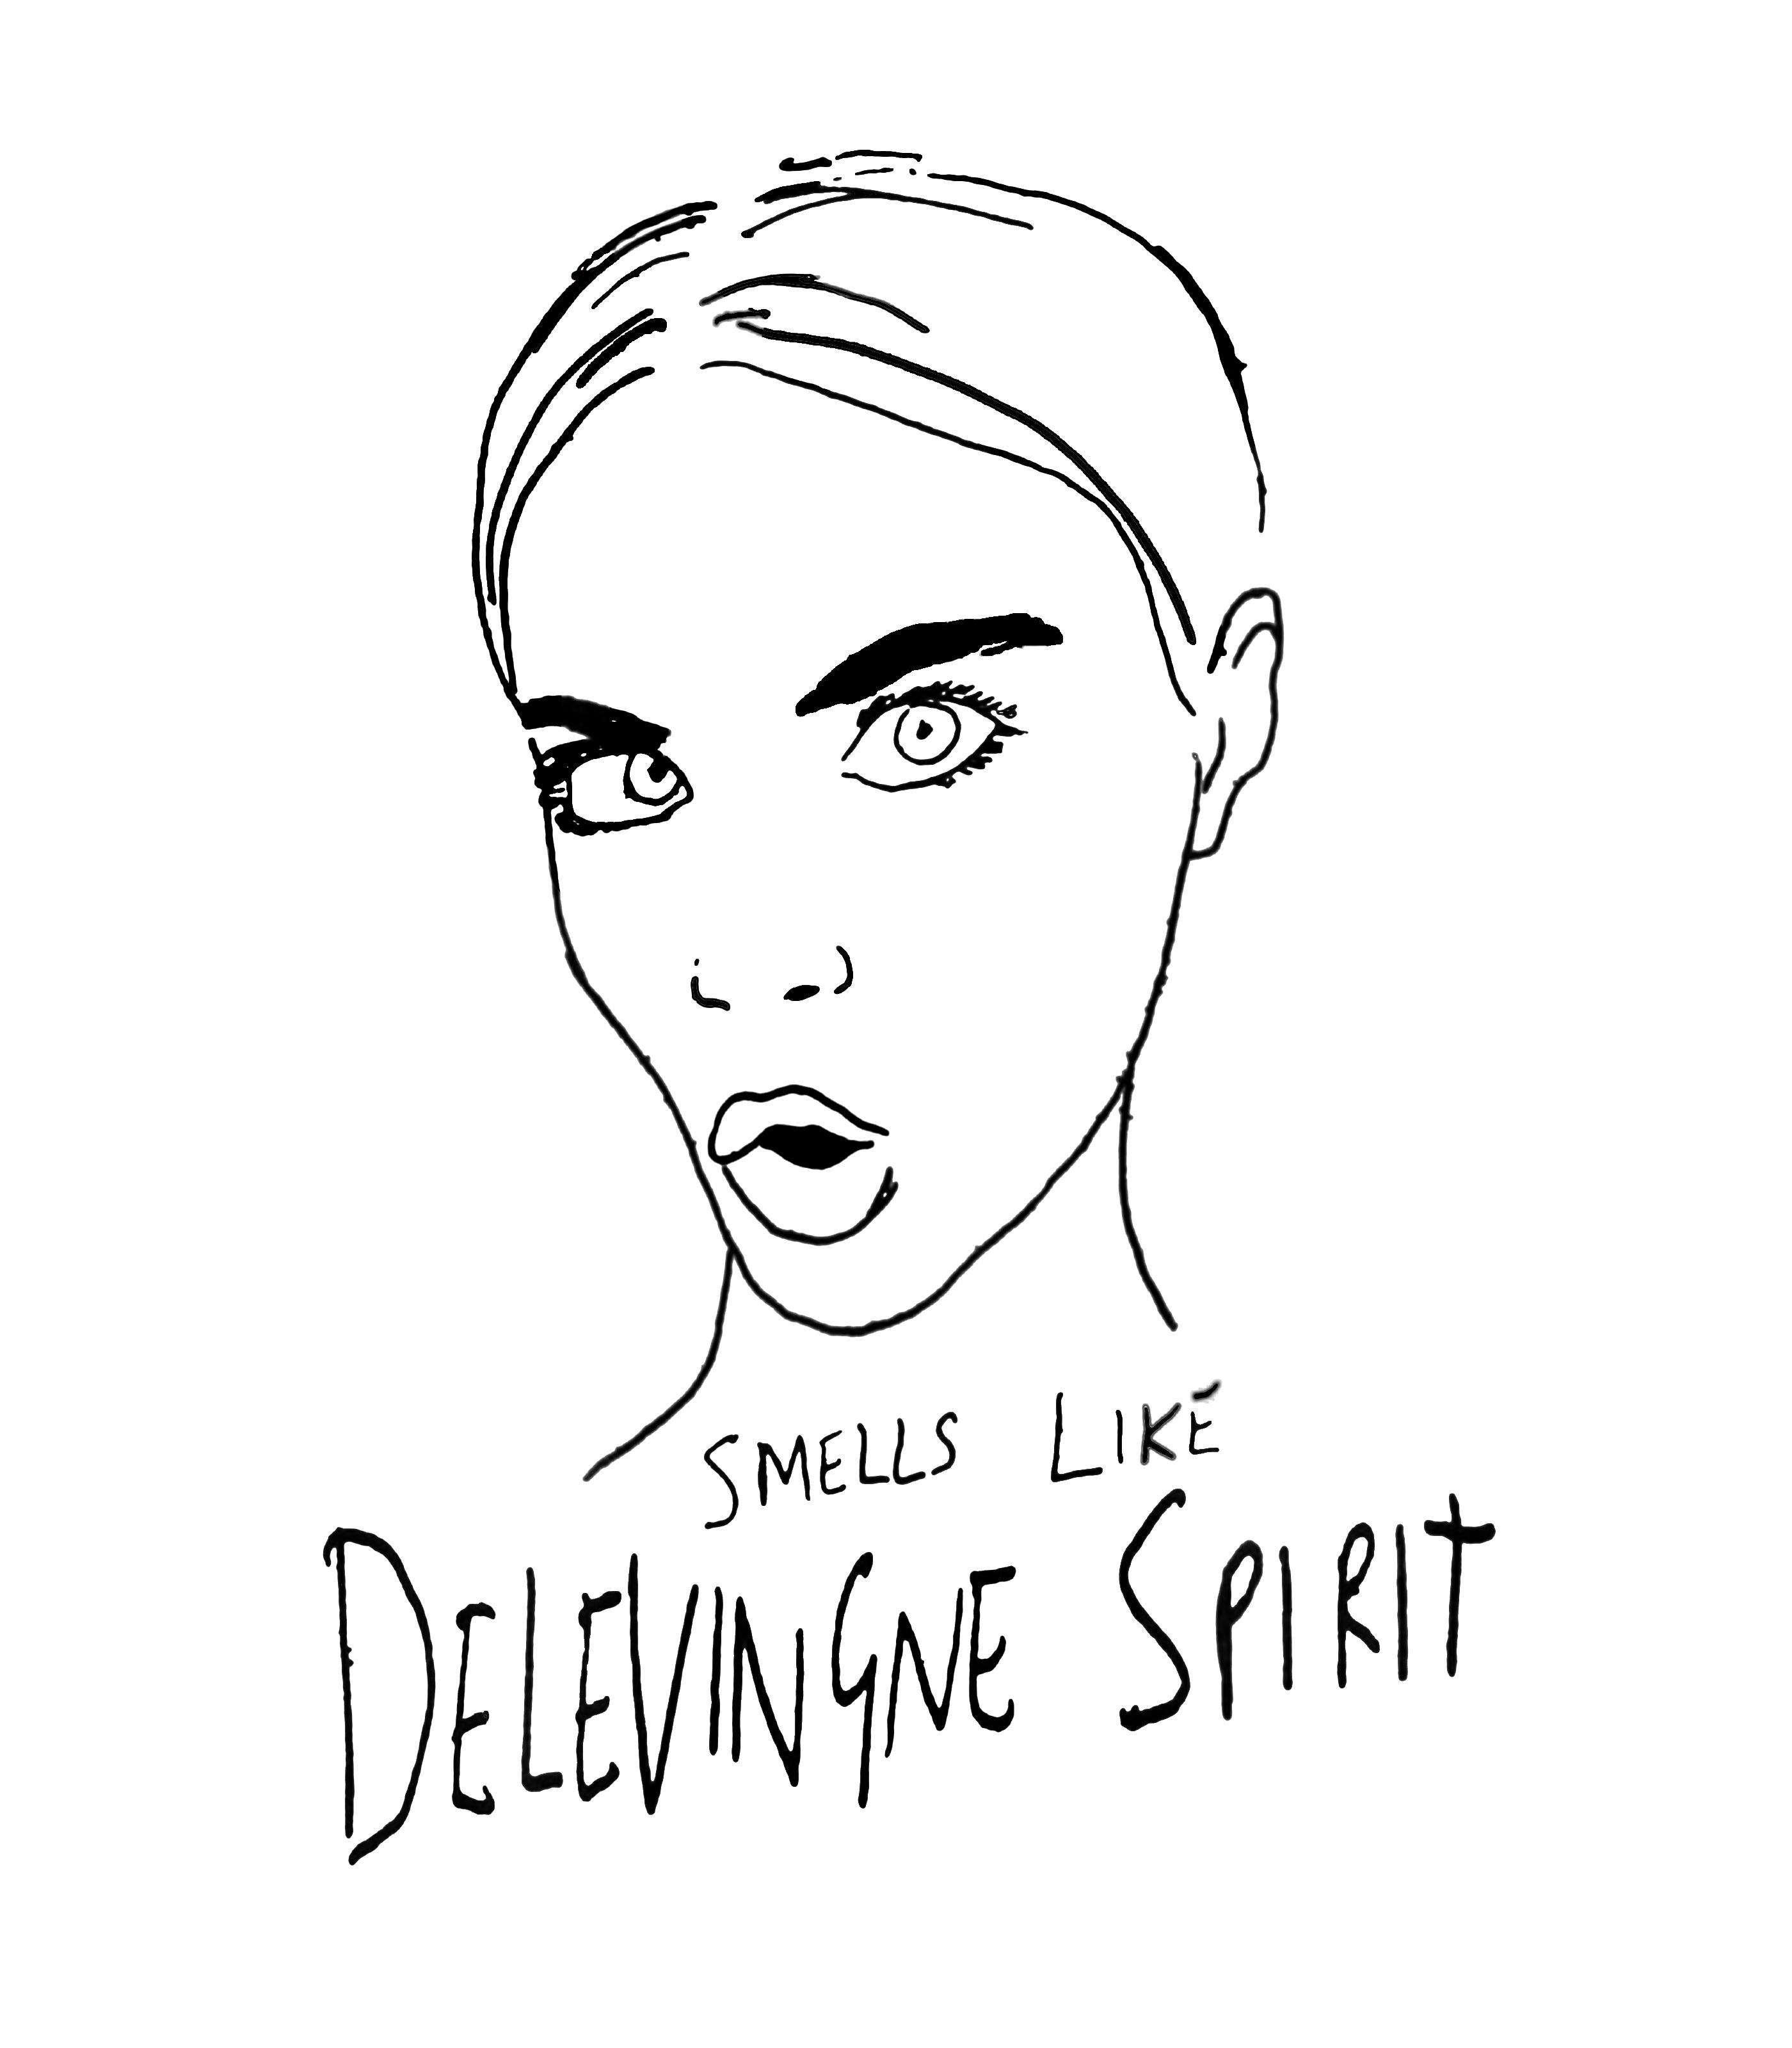 Camiseta Smells Like Delevingne Spirit